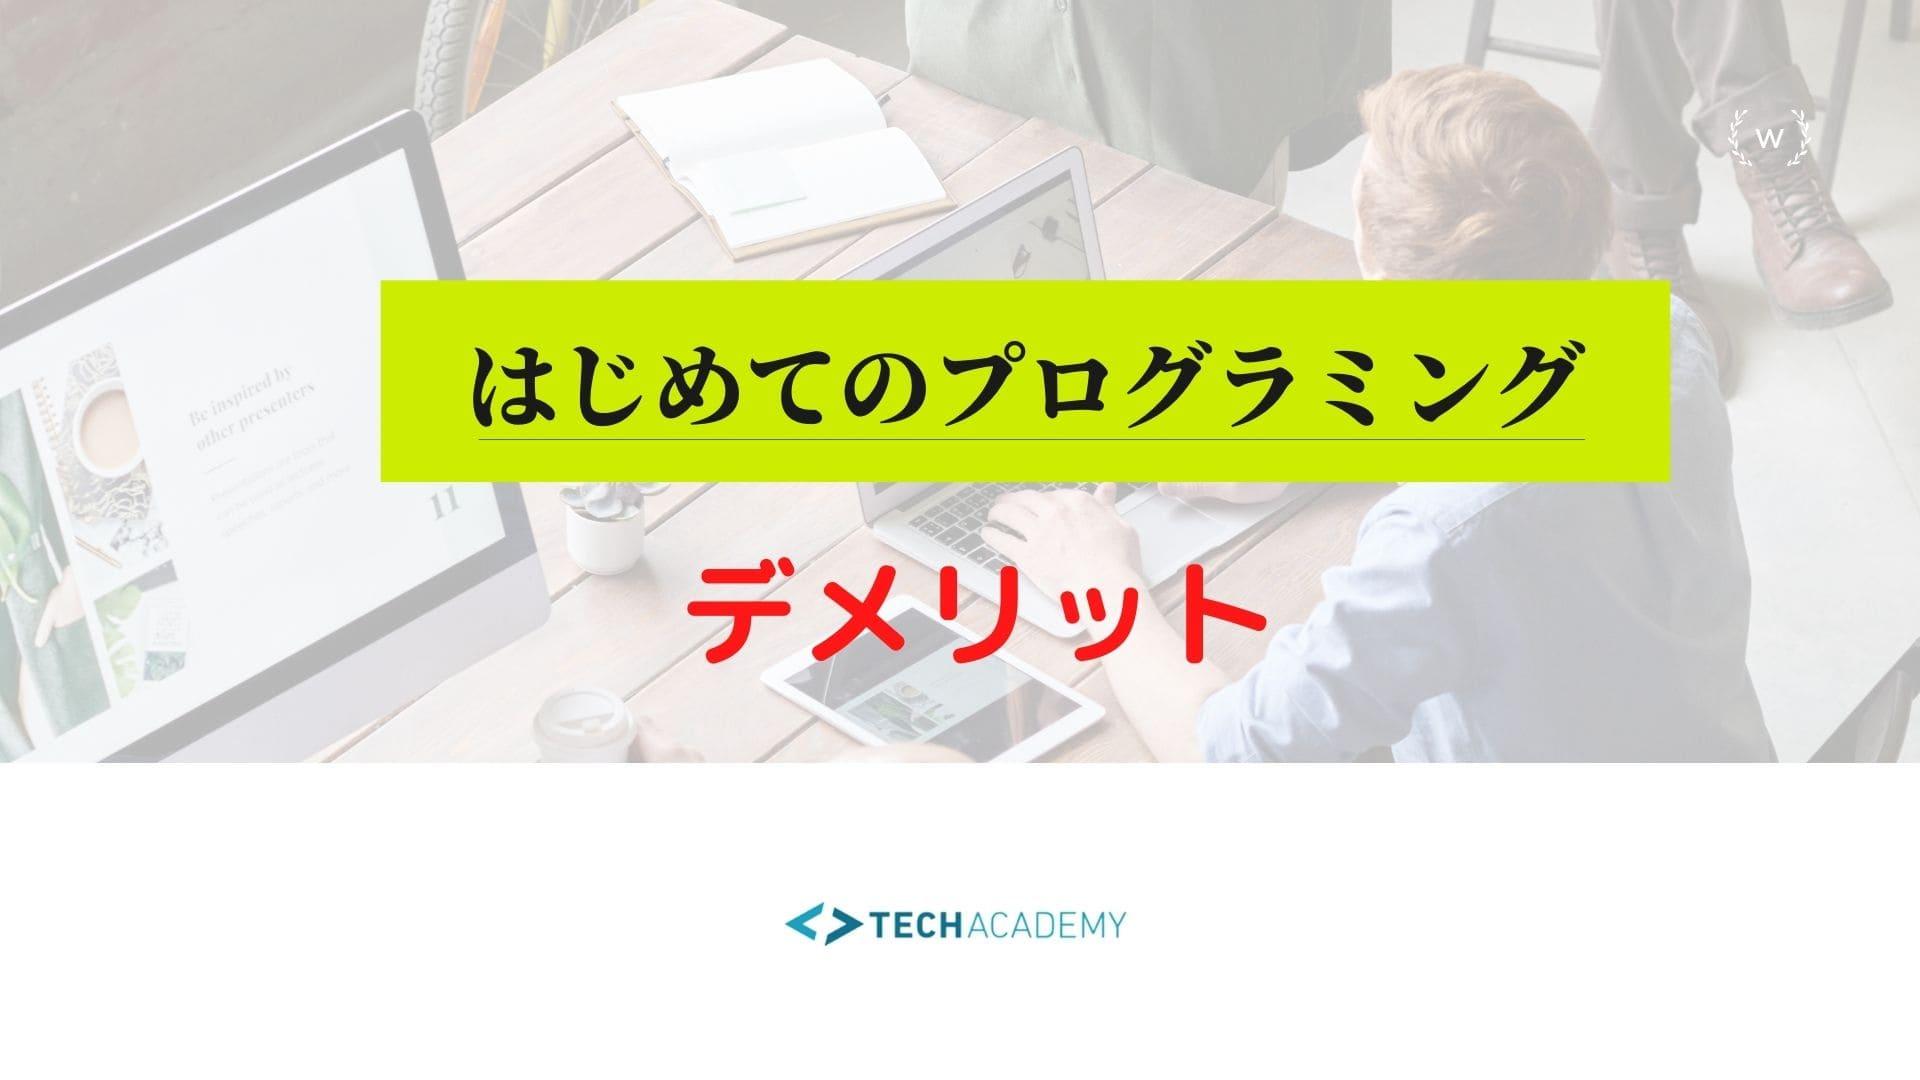 TechAcademy はじめてのプログラミングコース